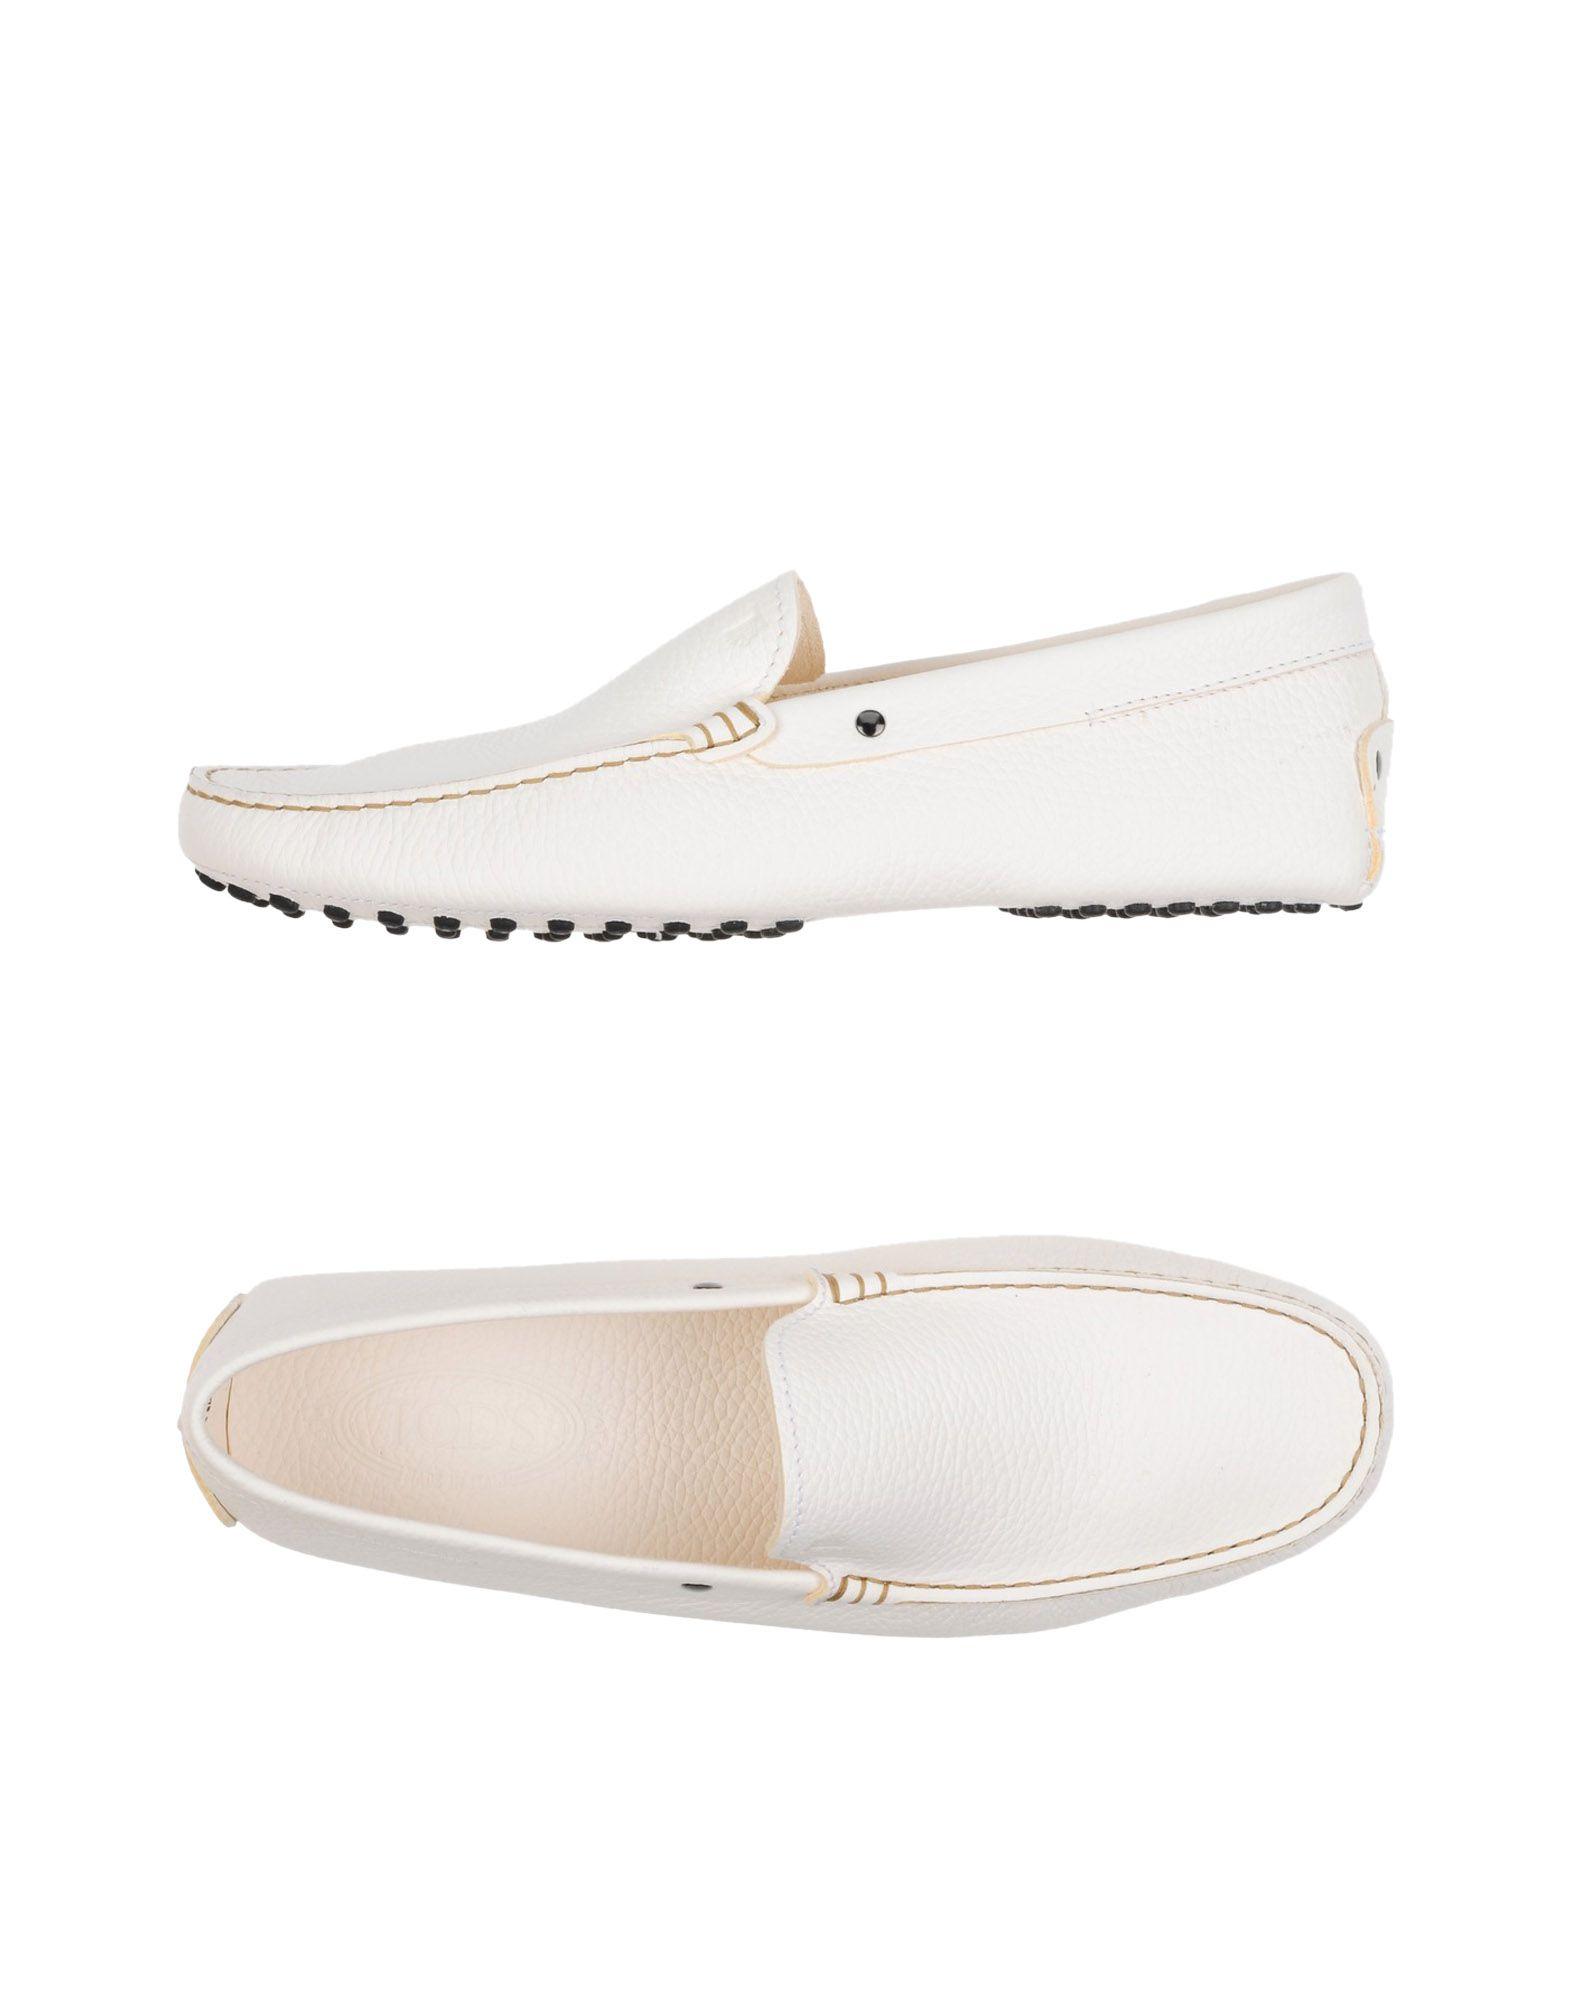 Tod's Mokassins Herren  11298397NL Gute Qualität beliebte Schuhe